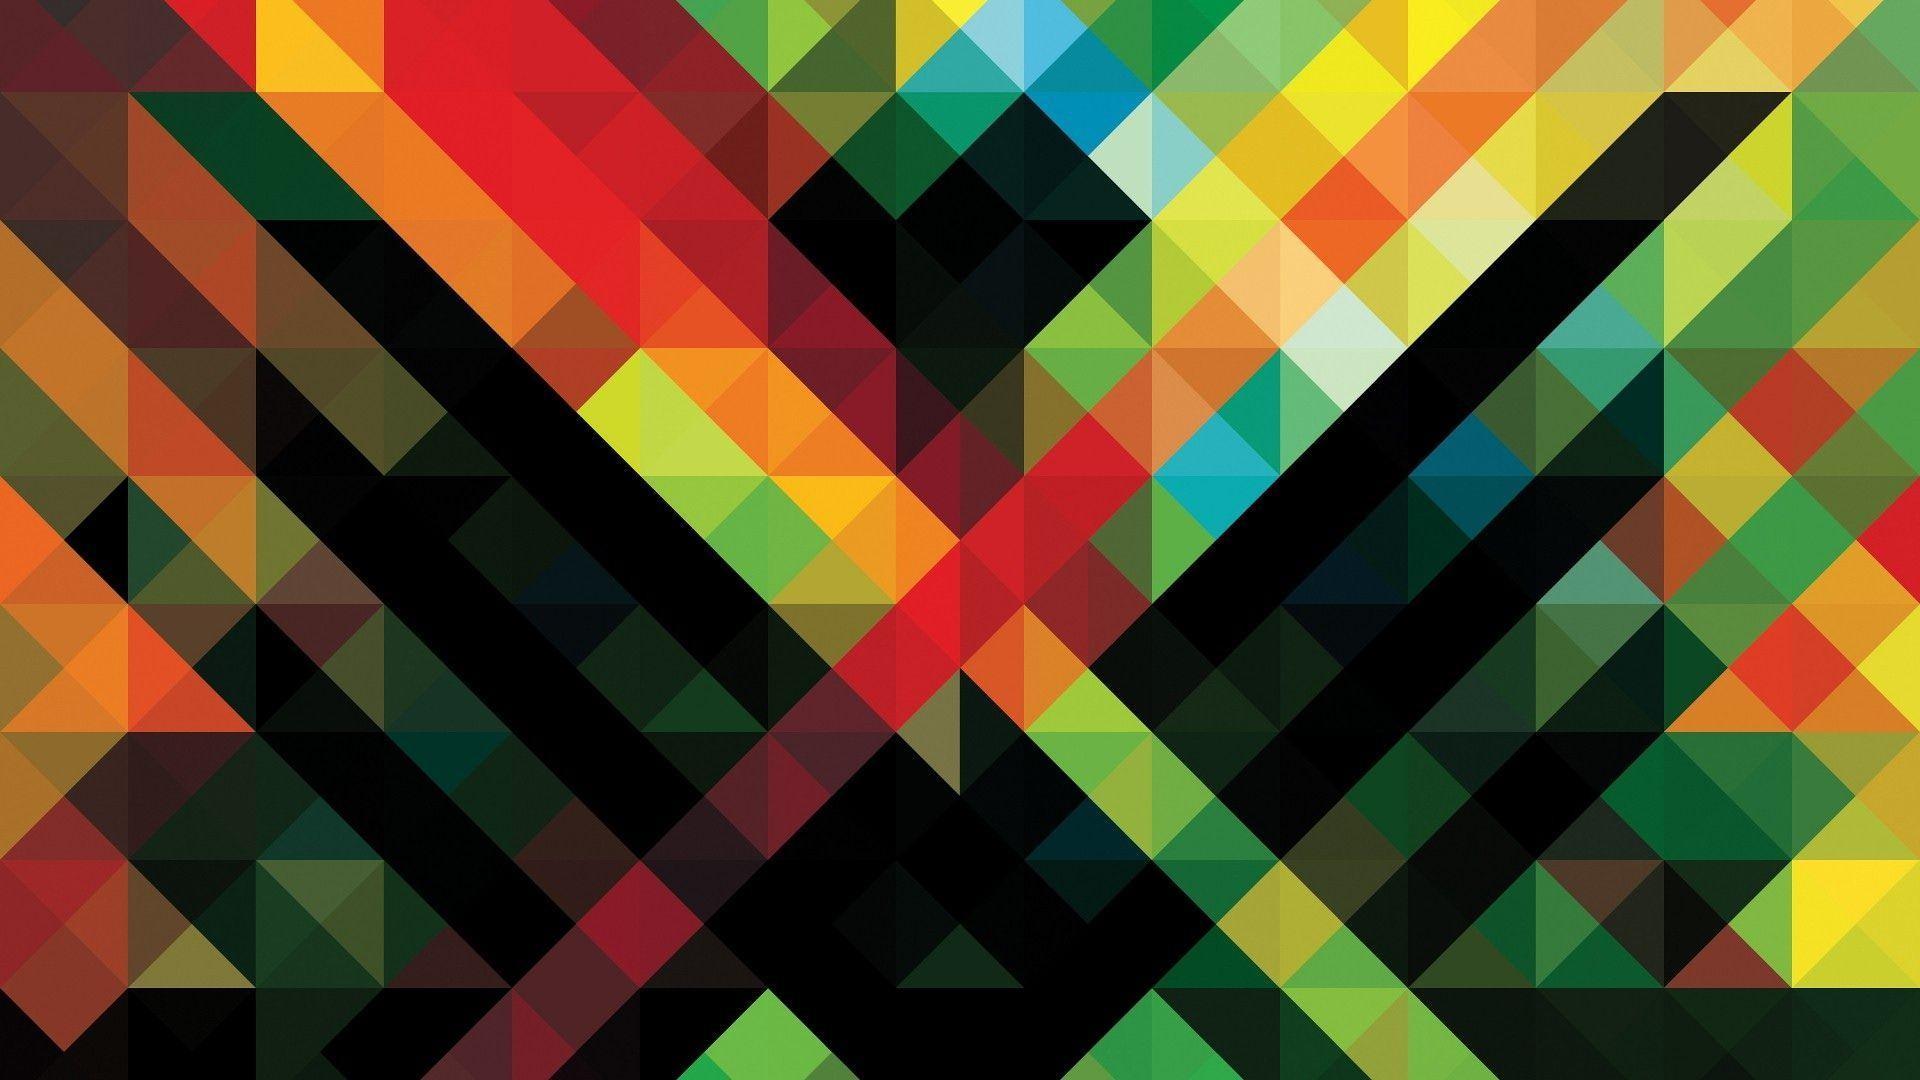 Abstract Geometric Wallpaper 184 – uMad.com